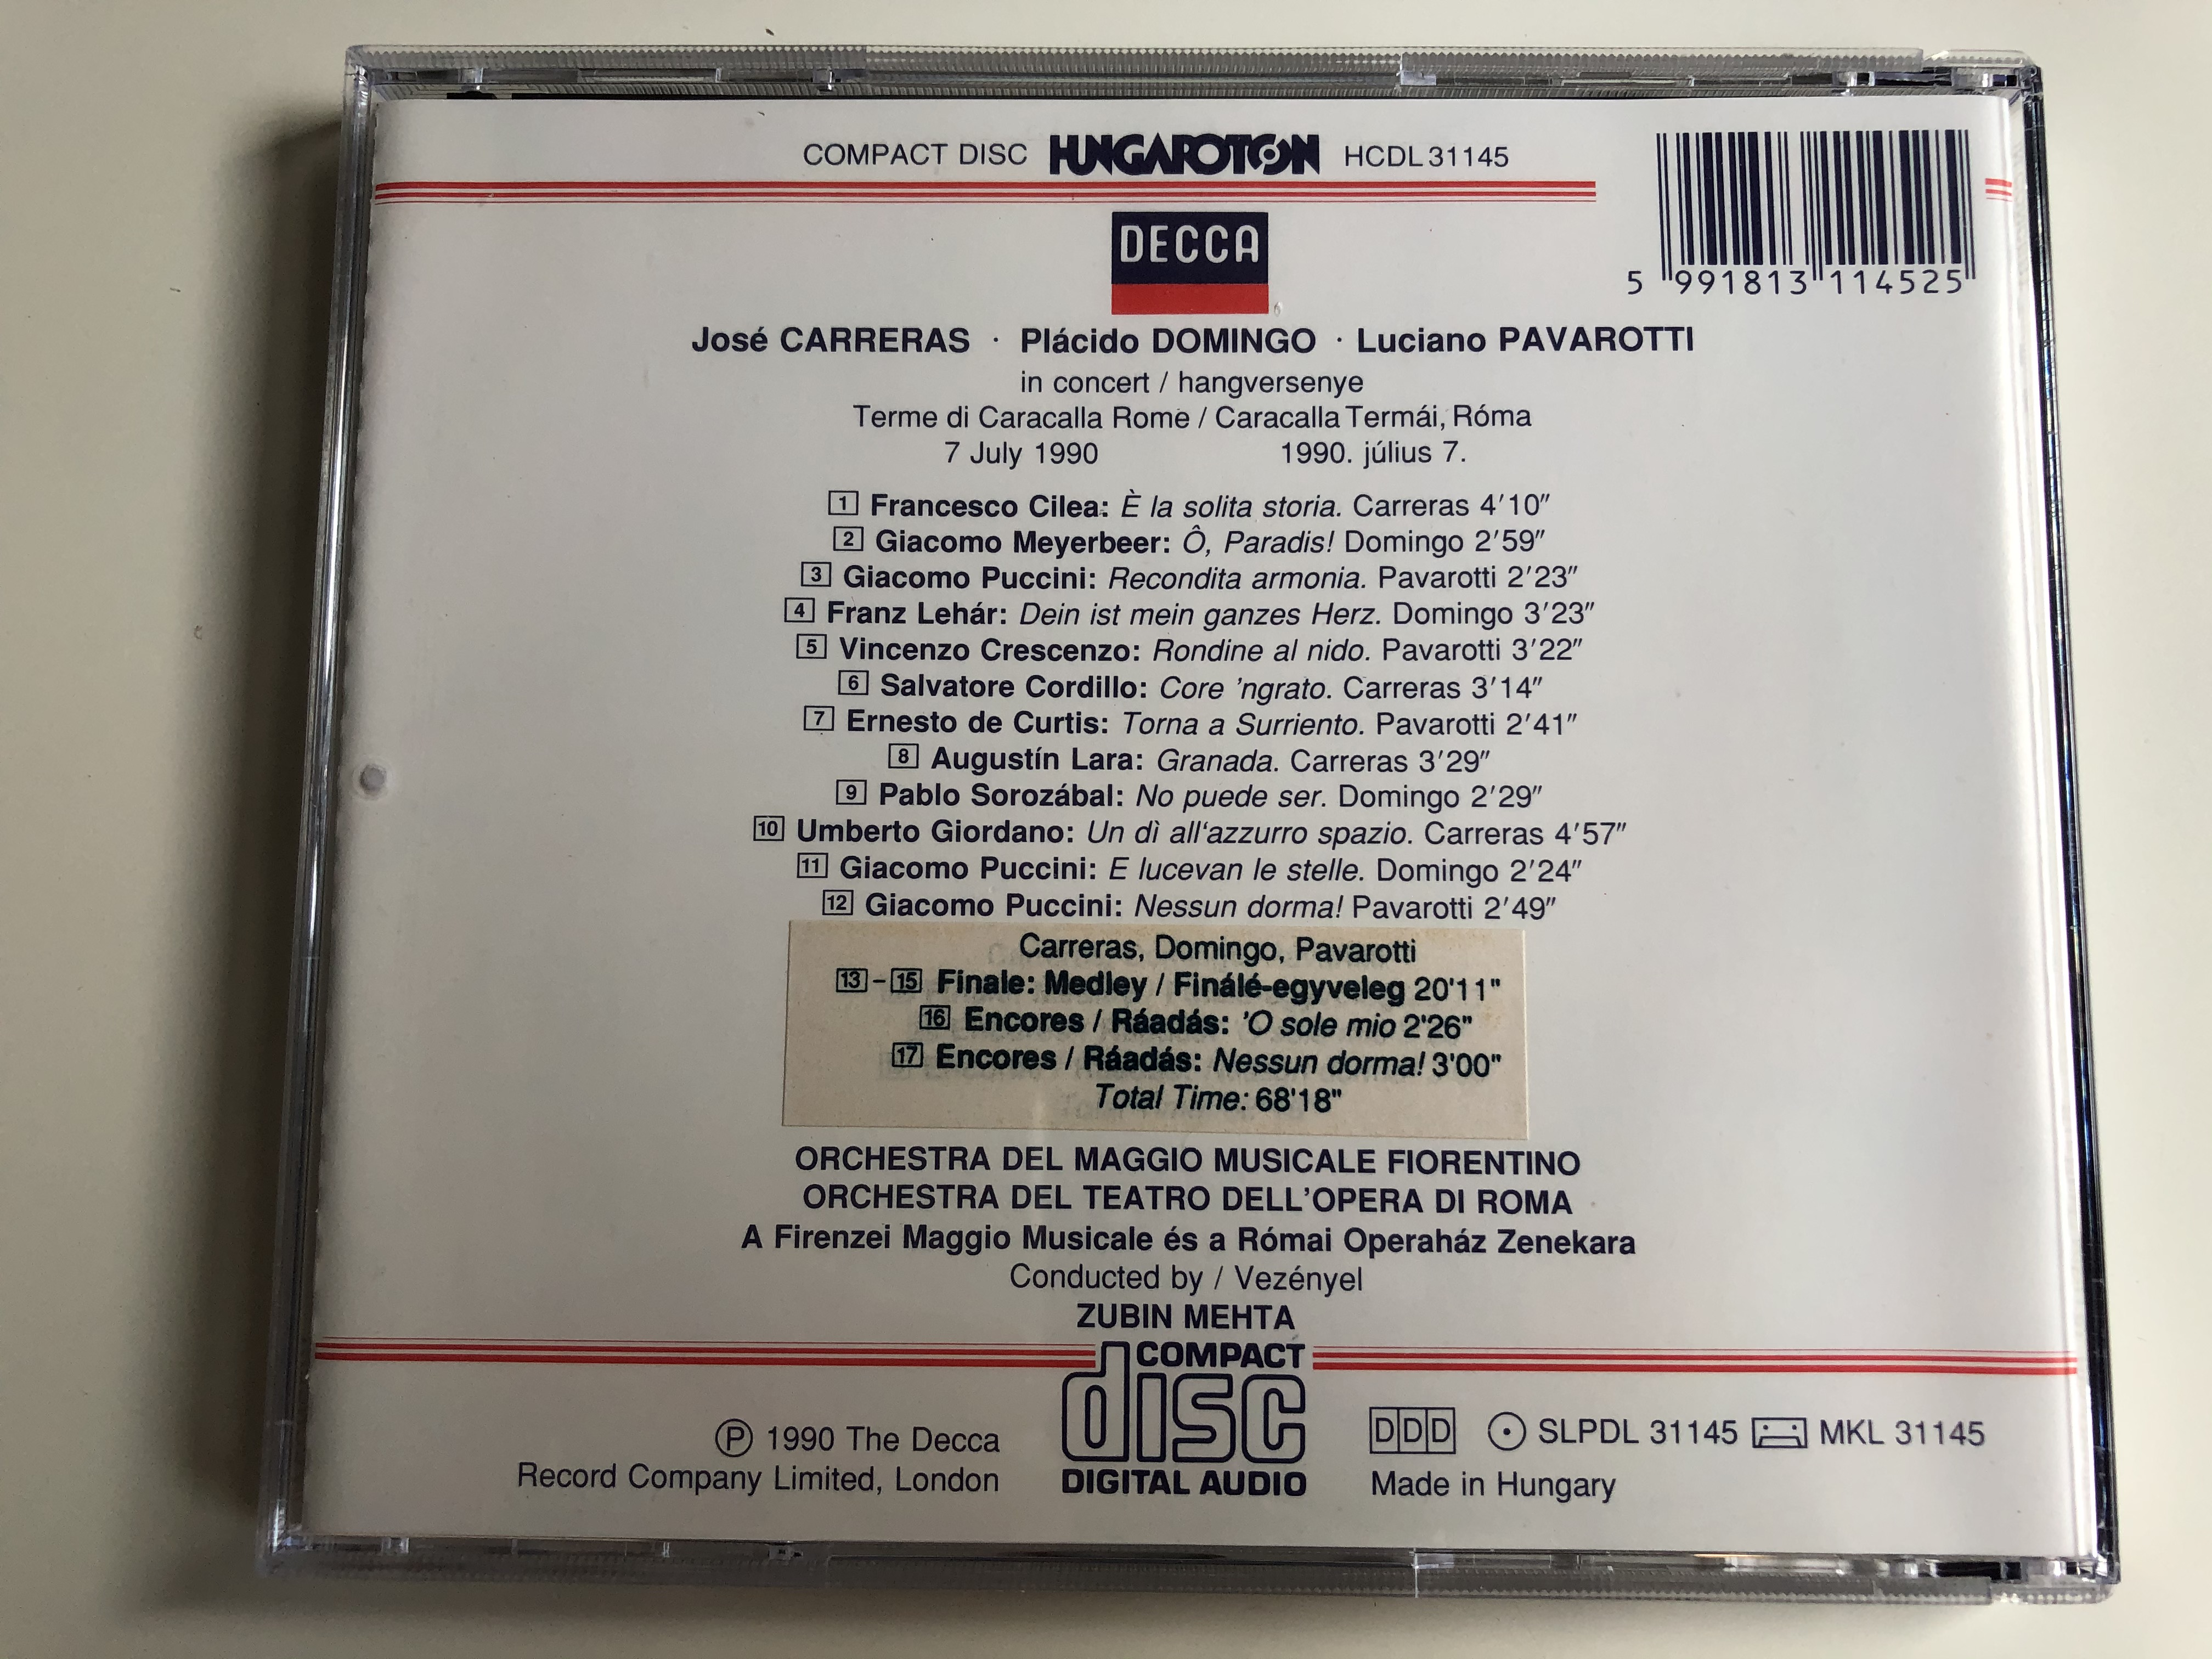 carreras-domingo-pavarotti-mehta-in-concert-hungaroton-audio-cd-1990-stereo-hcdl-31145-5-.jpg